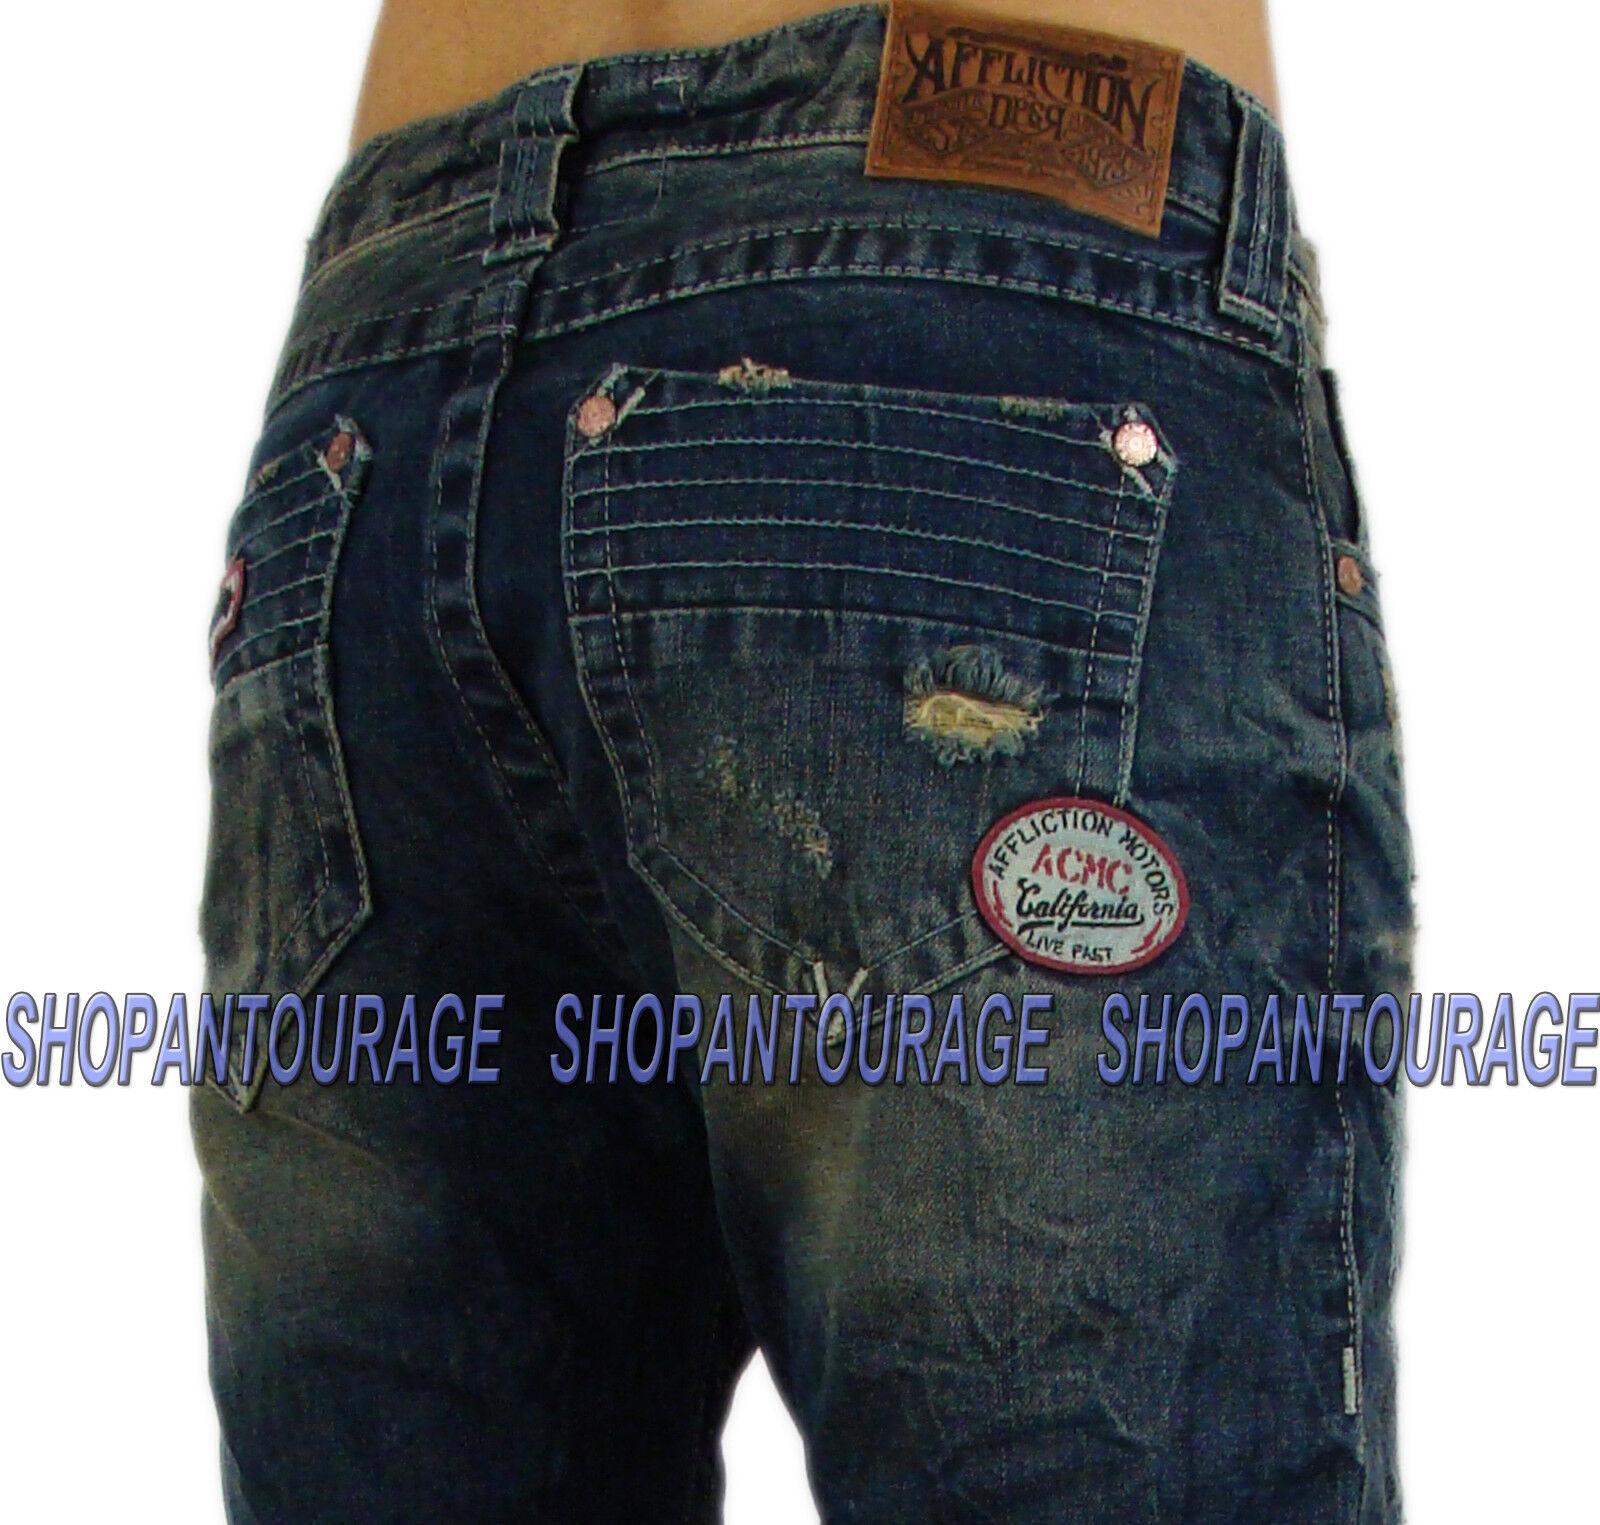 Affliction Ace Brixton Franklin 110ss074 hombres  `s Slim Straight DPSR Denim  compra en línea hoy